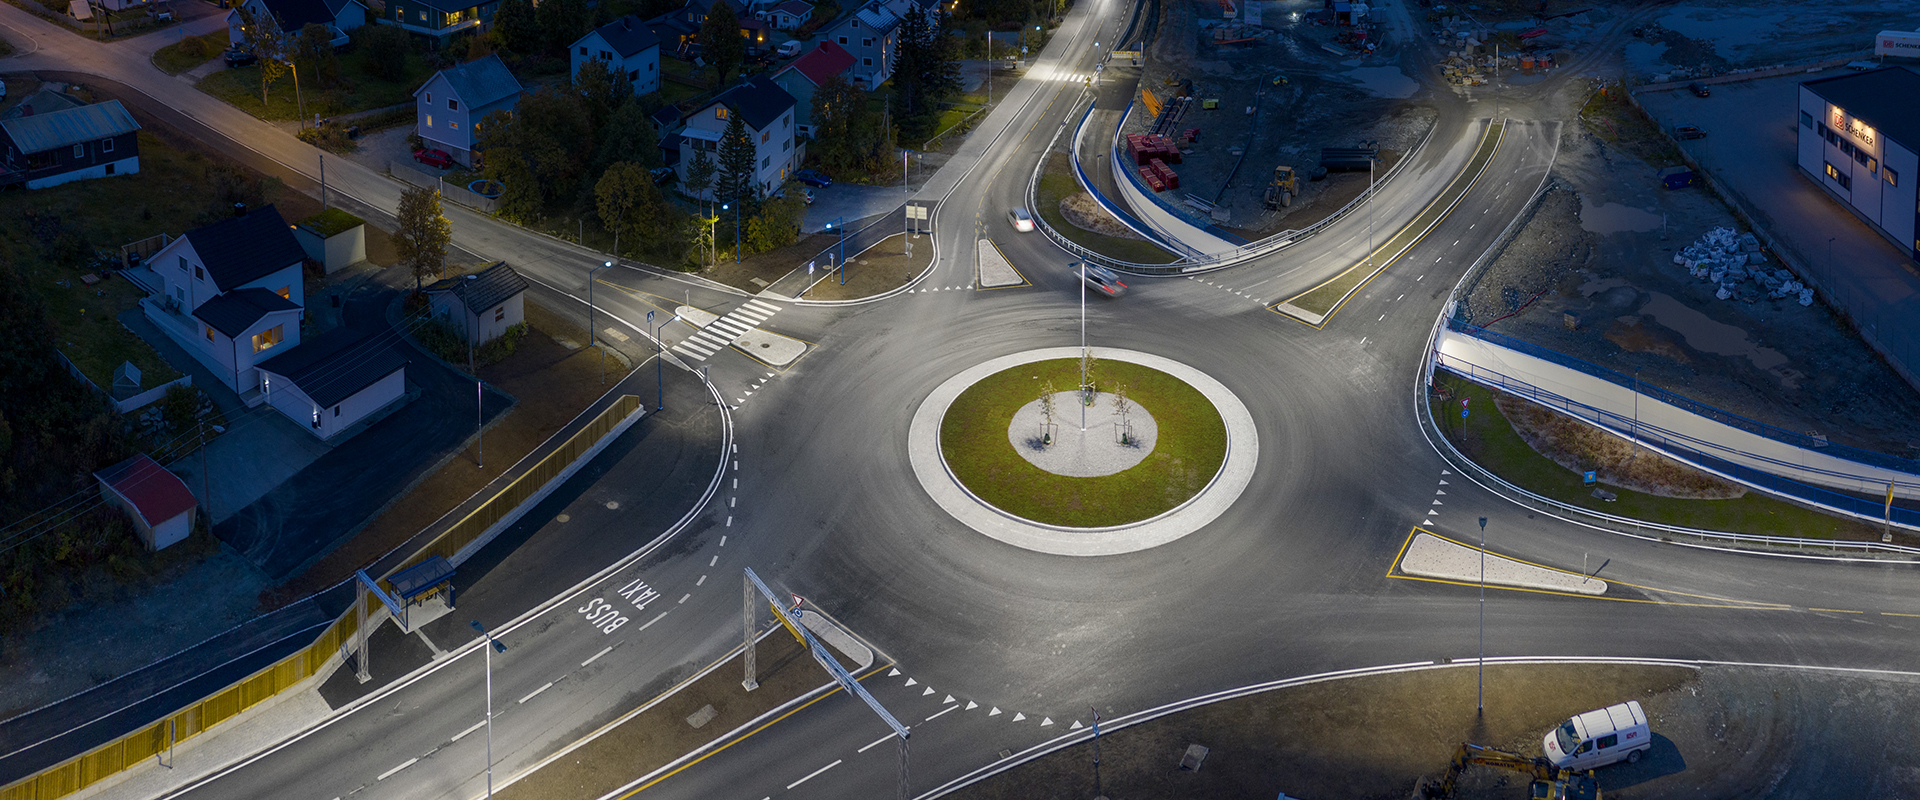 Illuminazione stradale LED di Tromsø